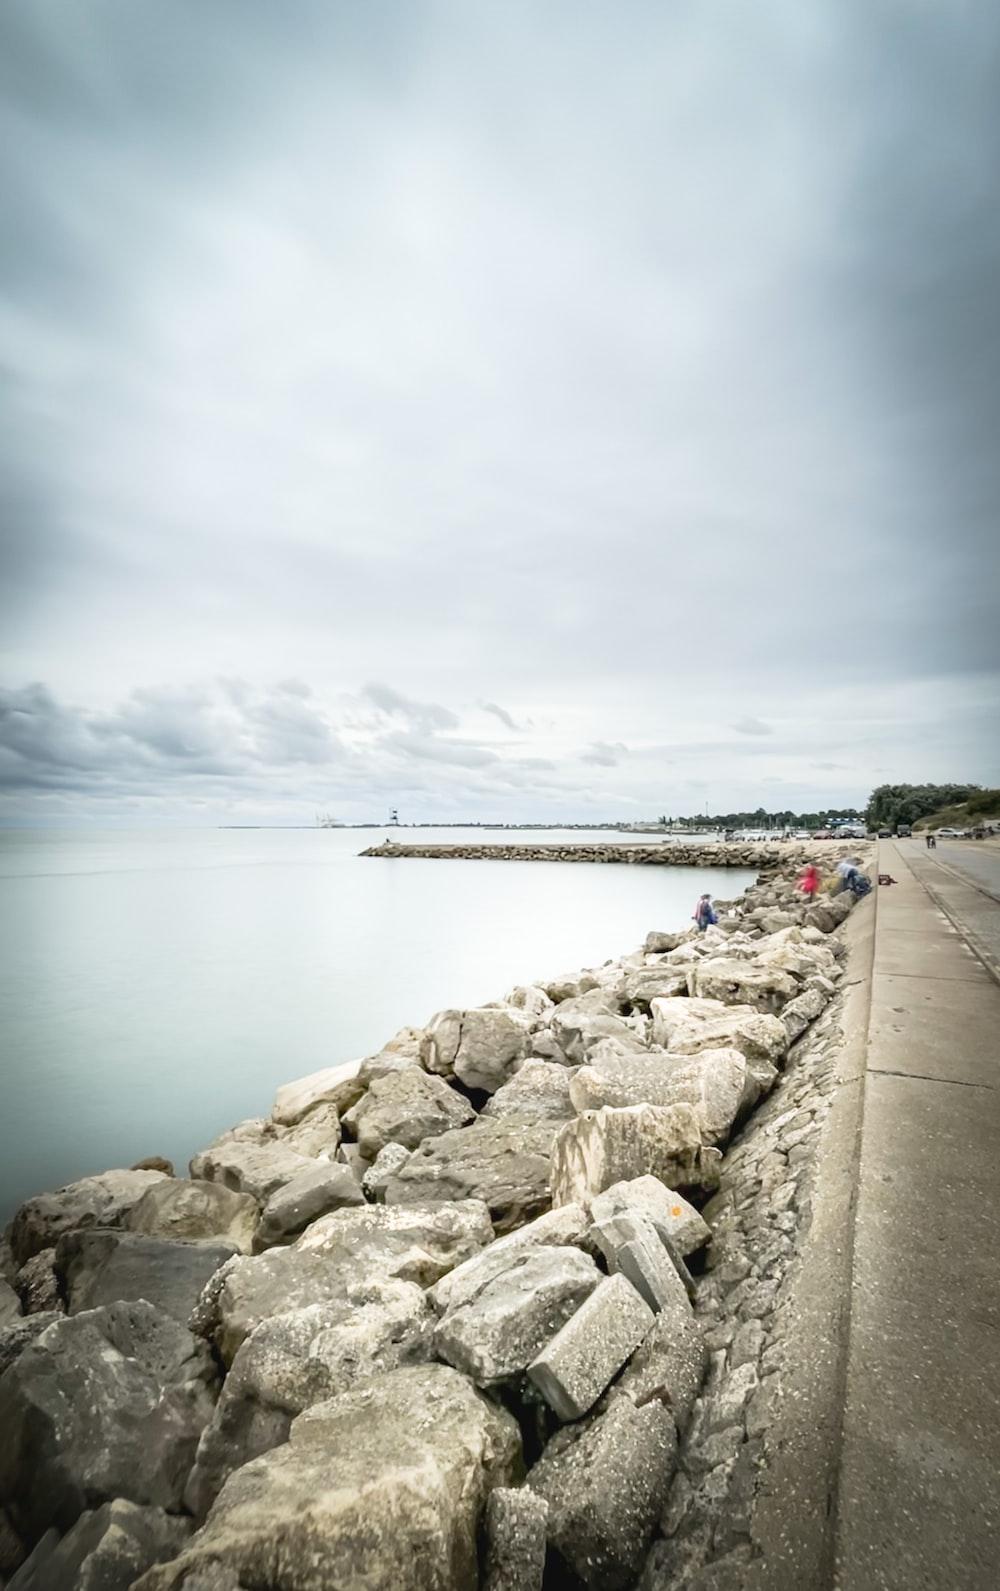 gray rocks near body of water under gray sky